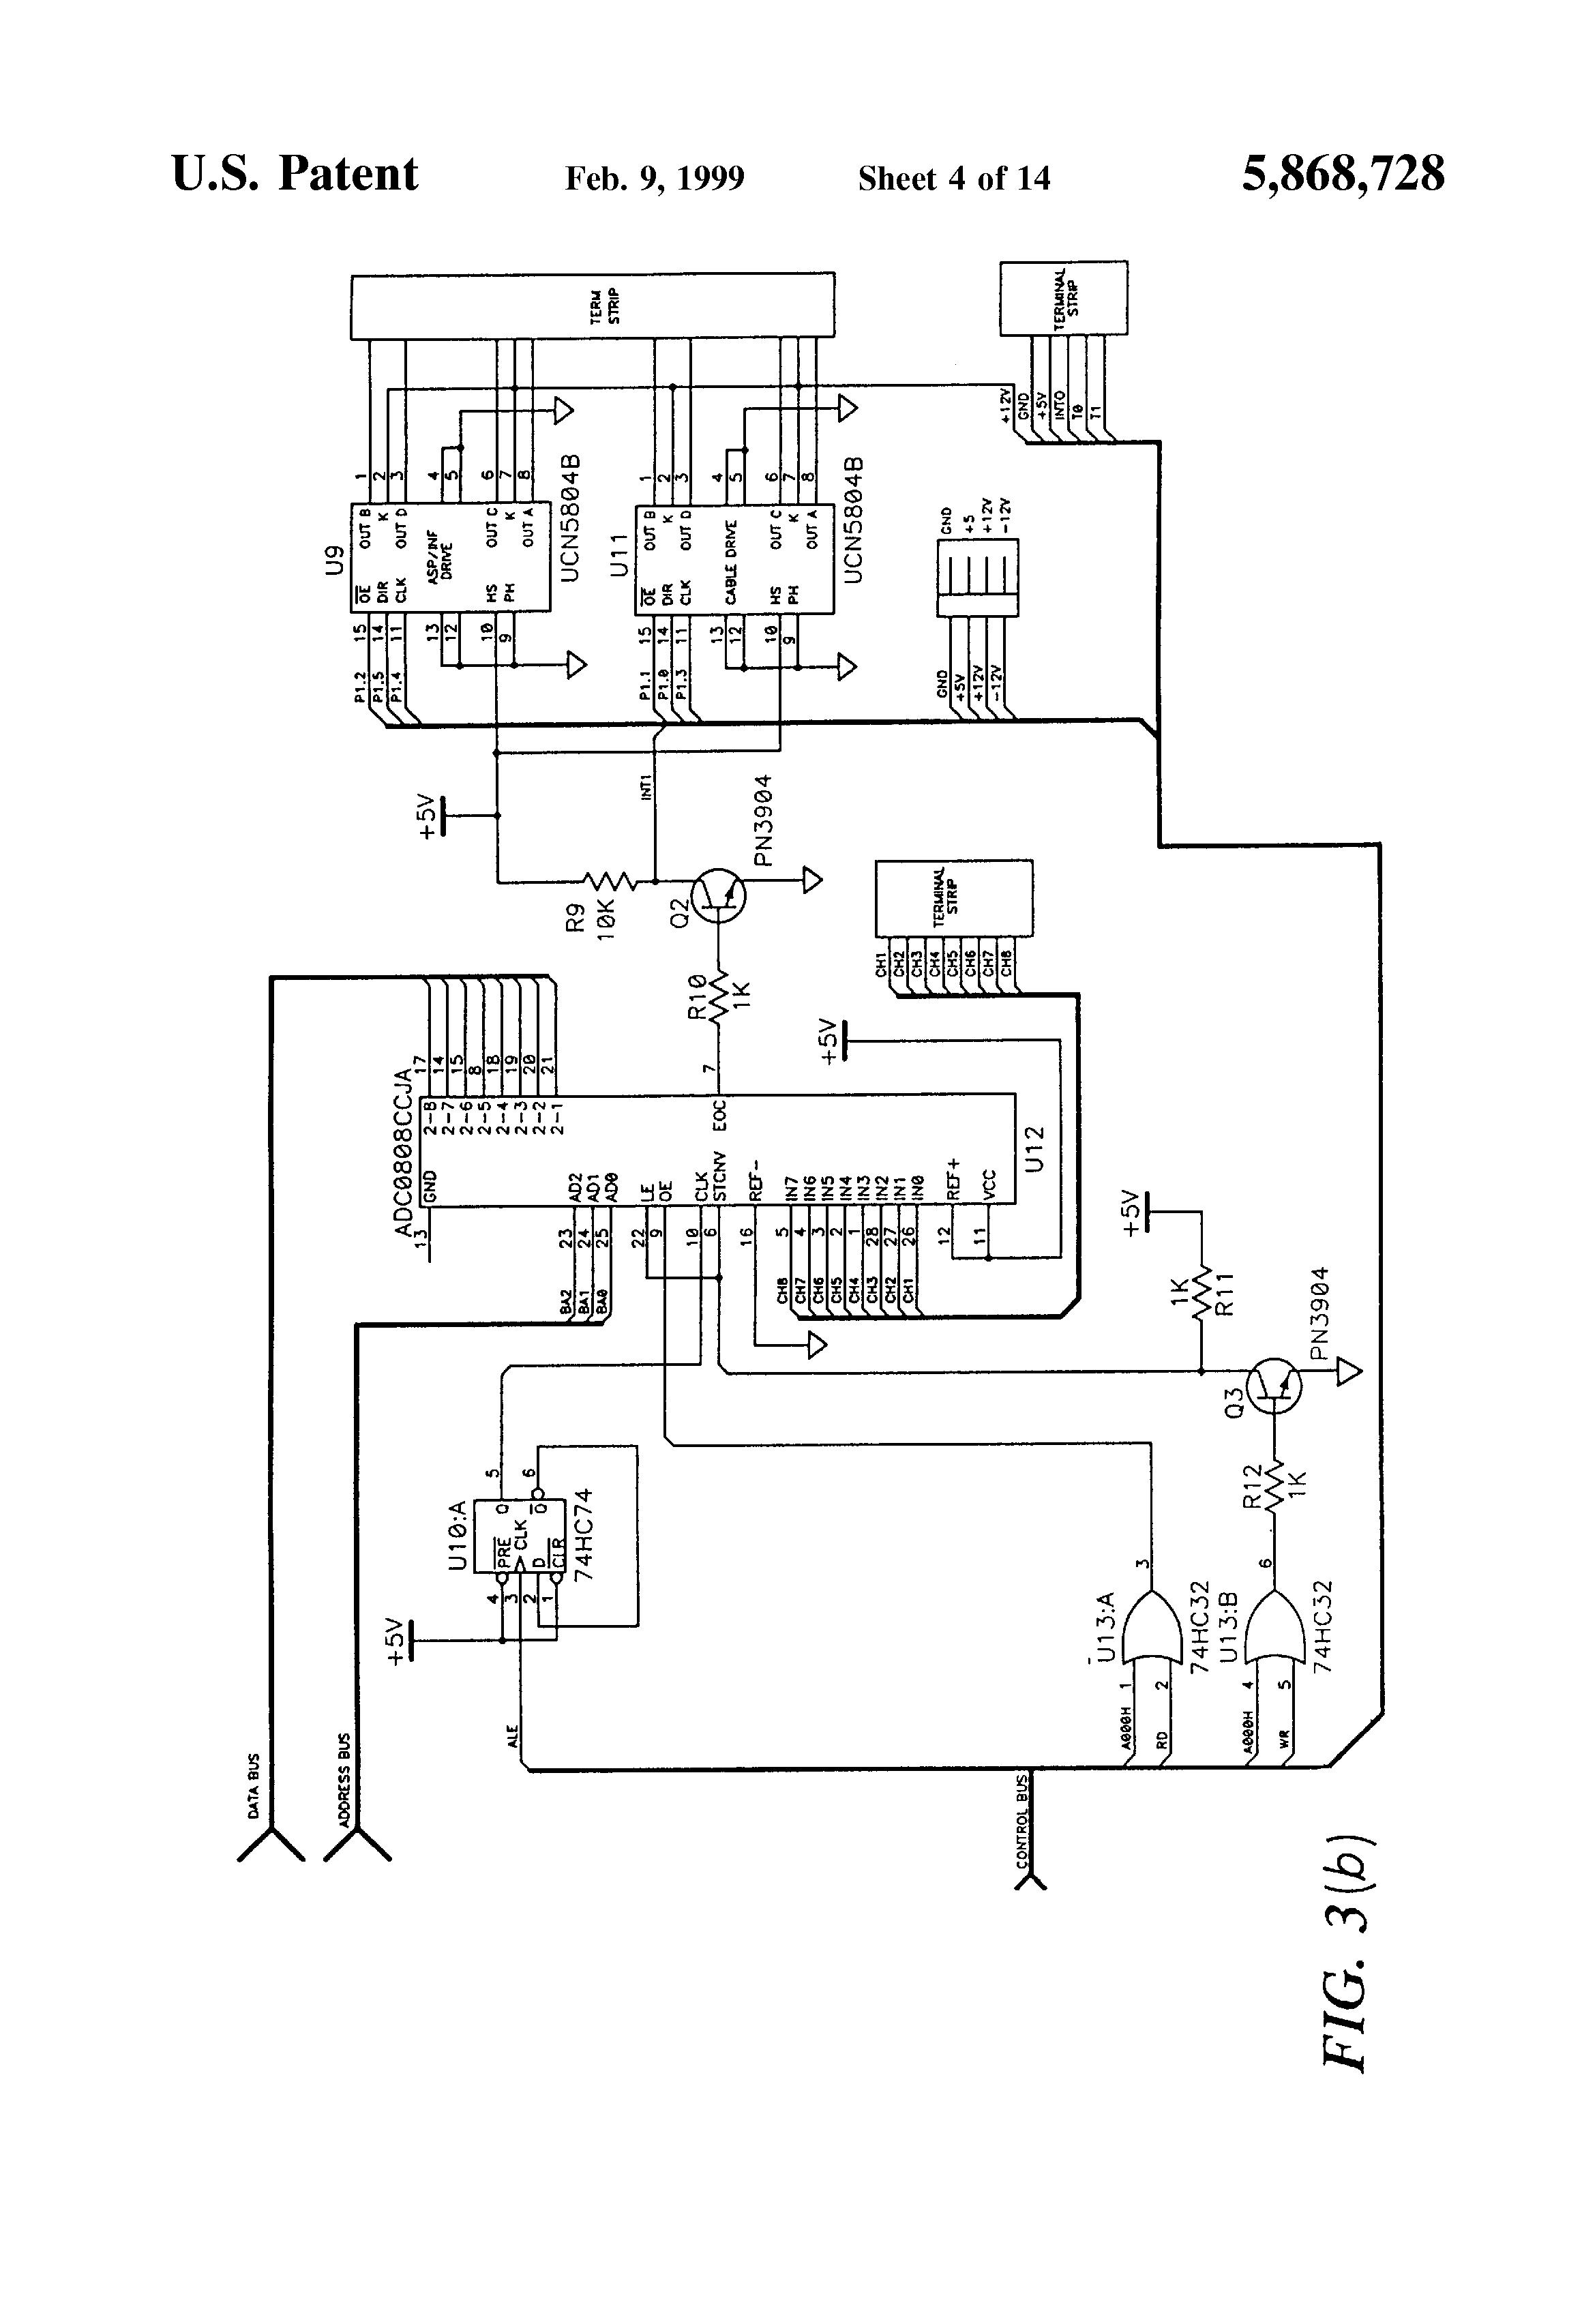 35 Rcs Actuator Wiring Diagram